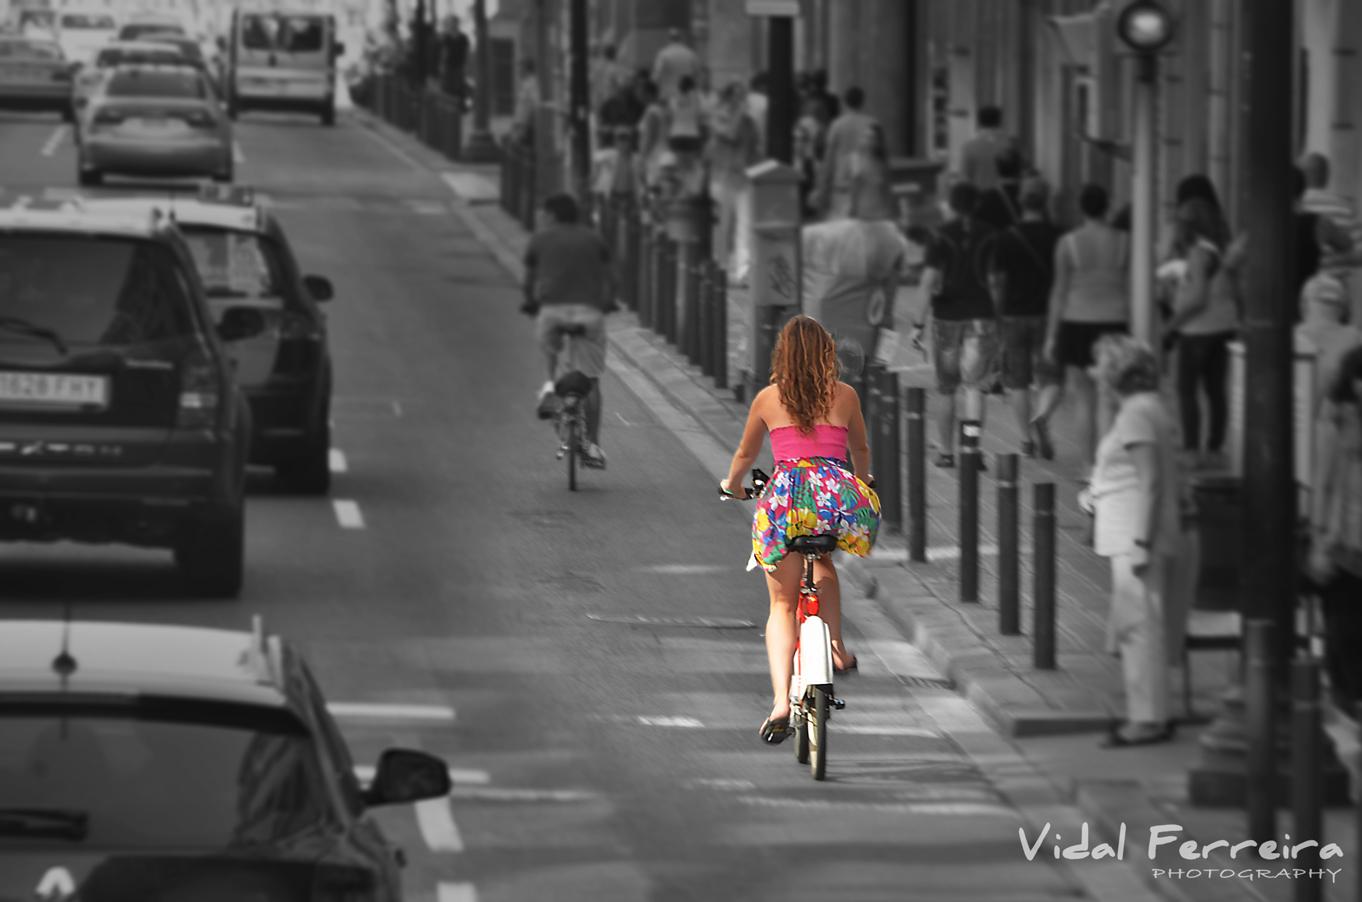 She - Madrid, Spain